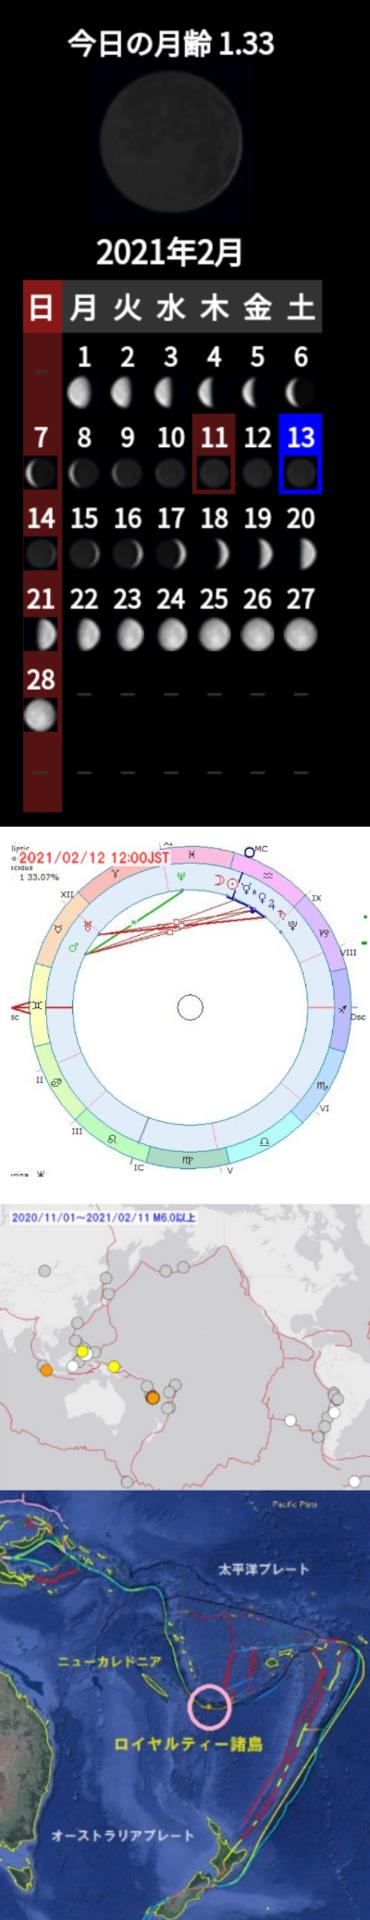 Screenshot_20210210-002859.png